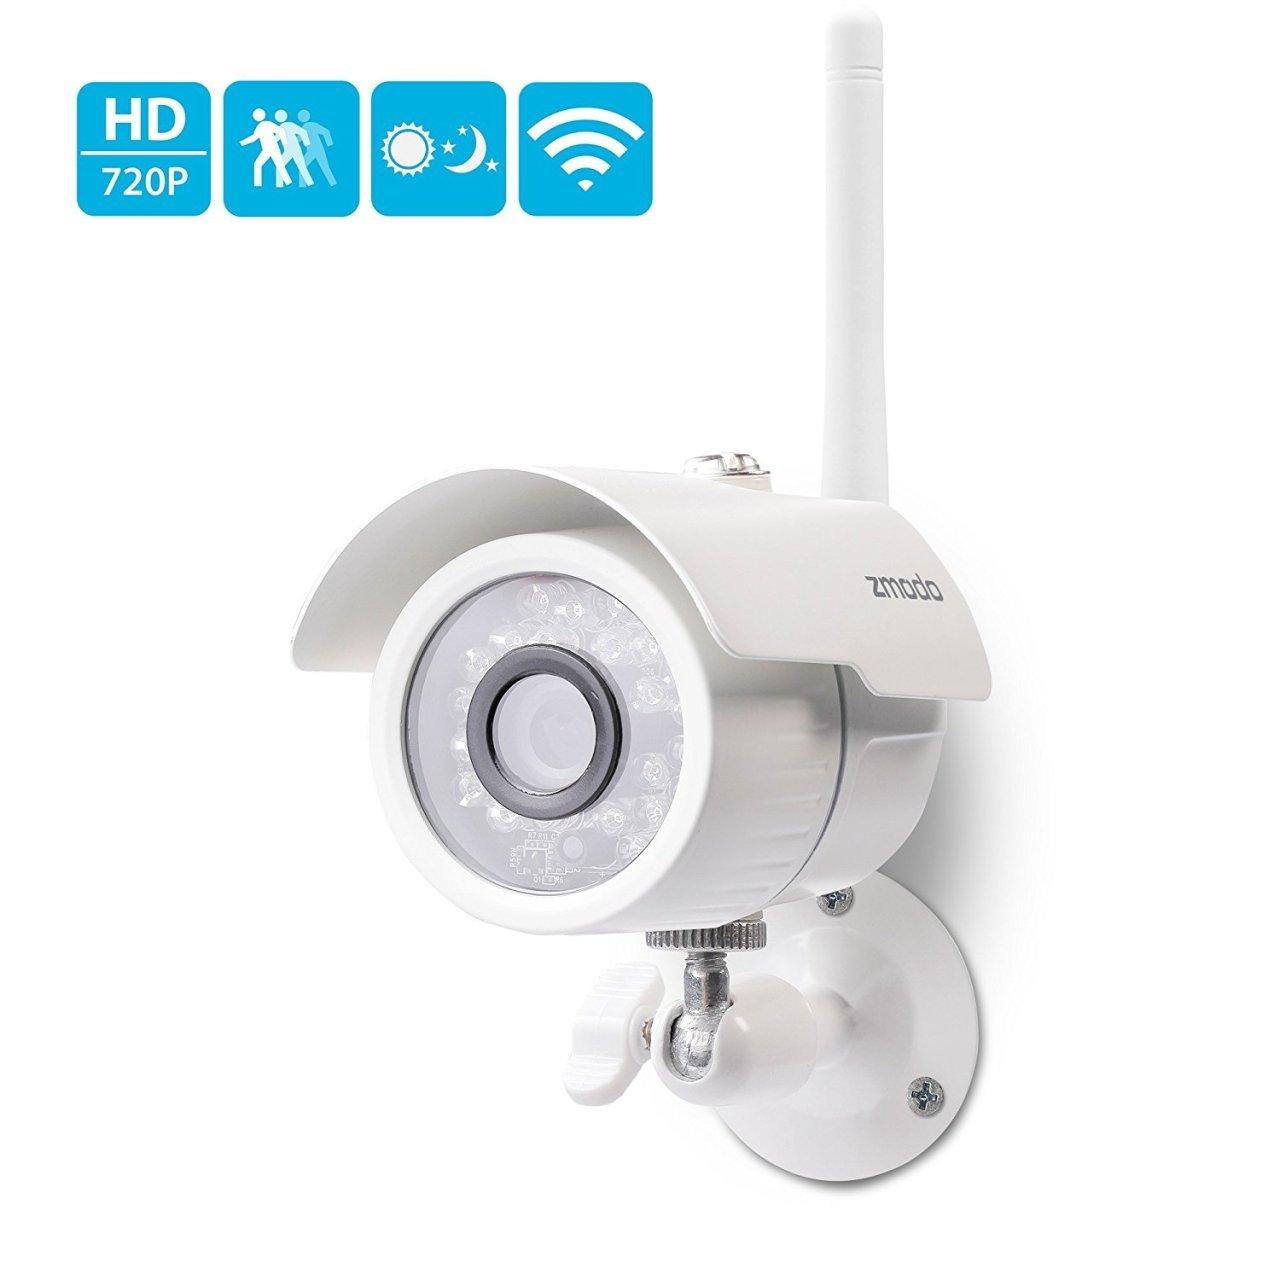 Zmodo 720p HD Outdoor Home Wireless Security Surveillance Video C